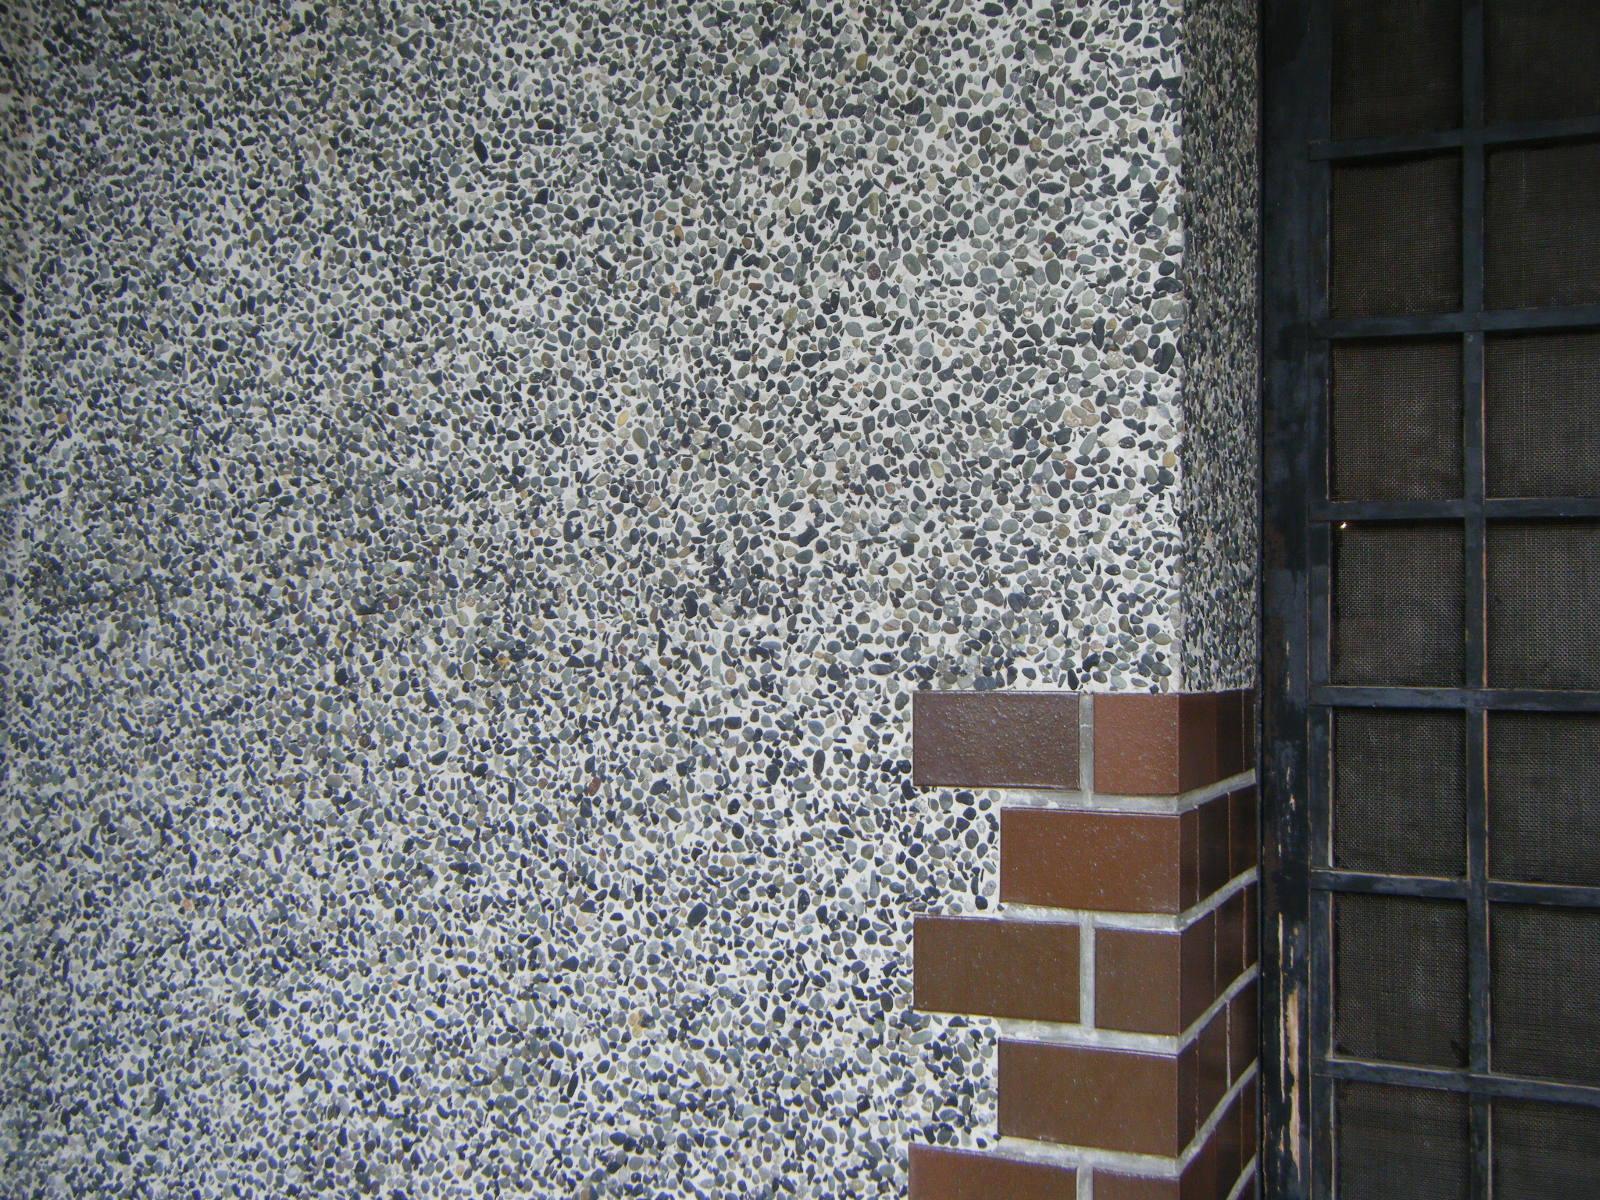 豆砂利引き画像(玄関)3